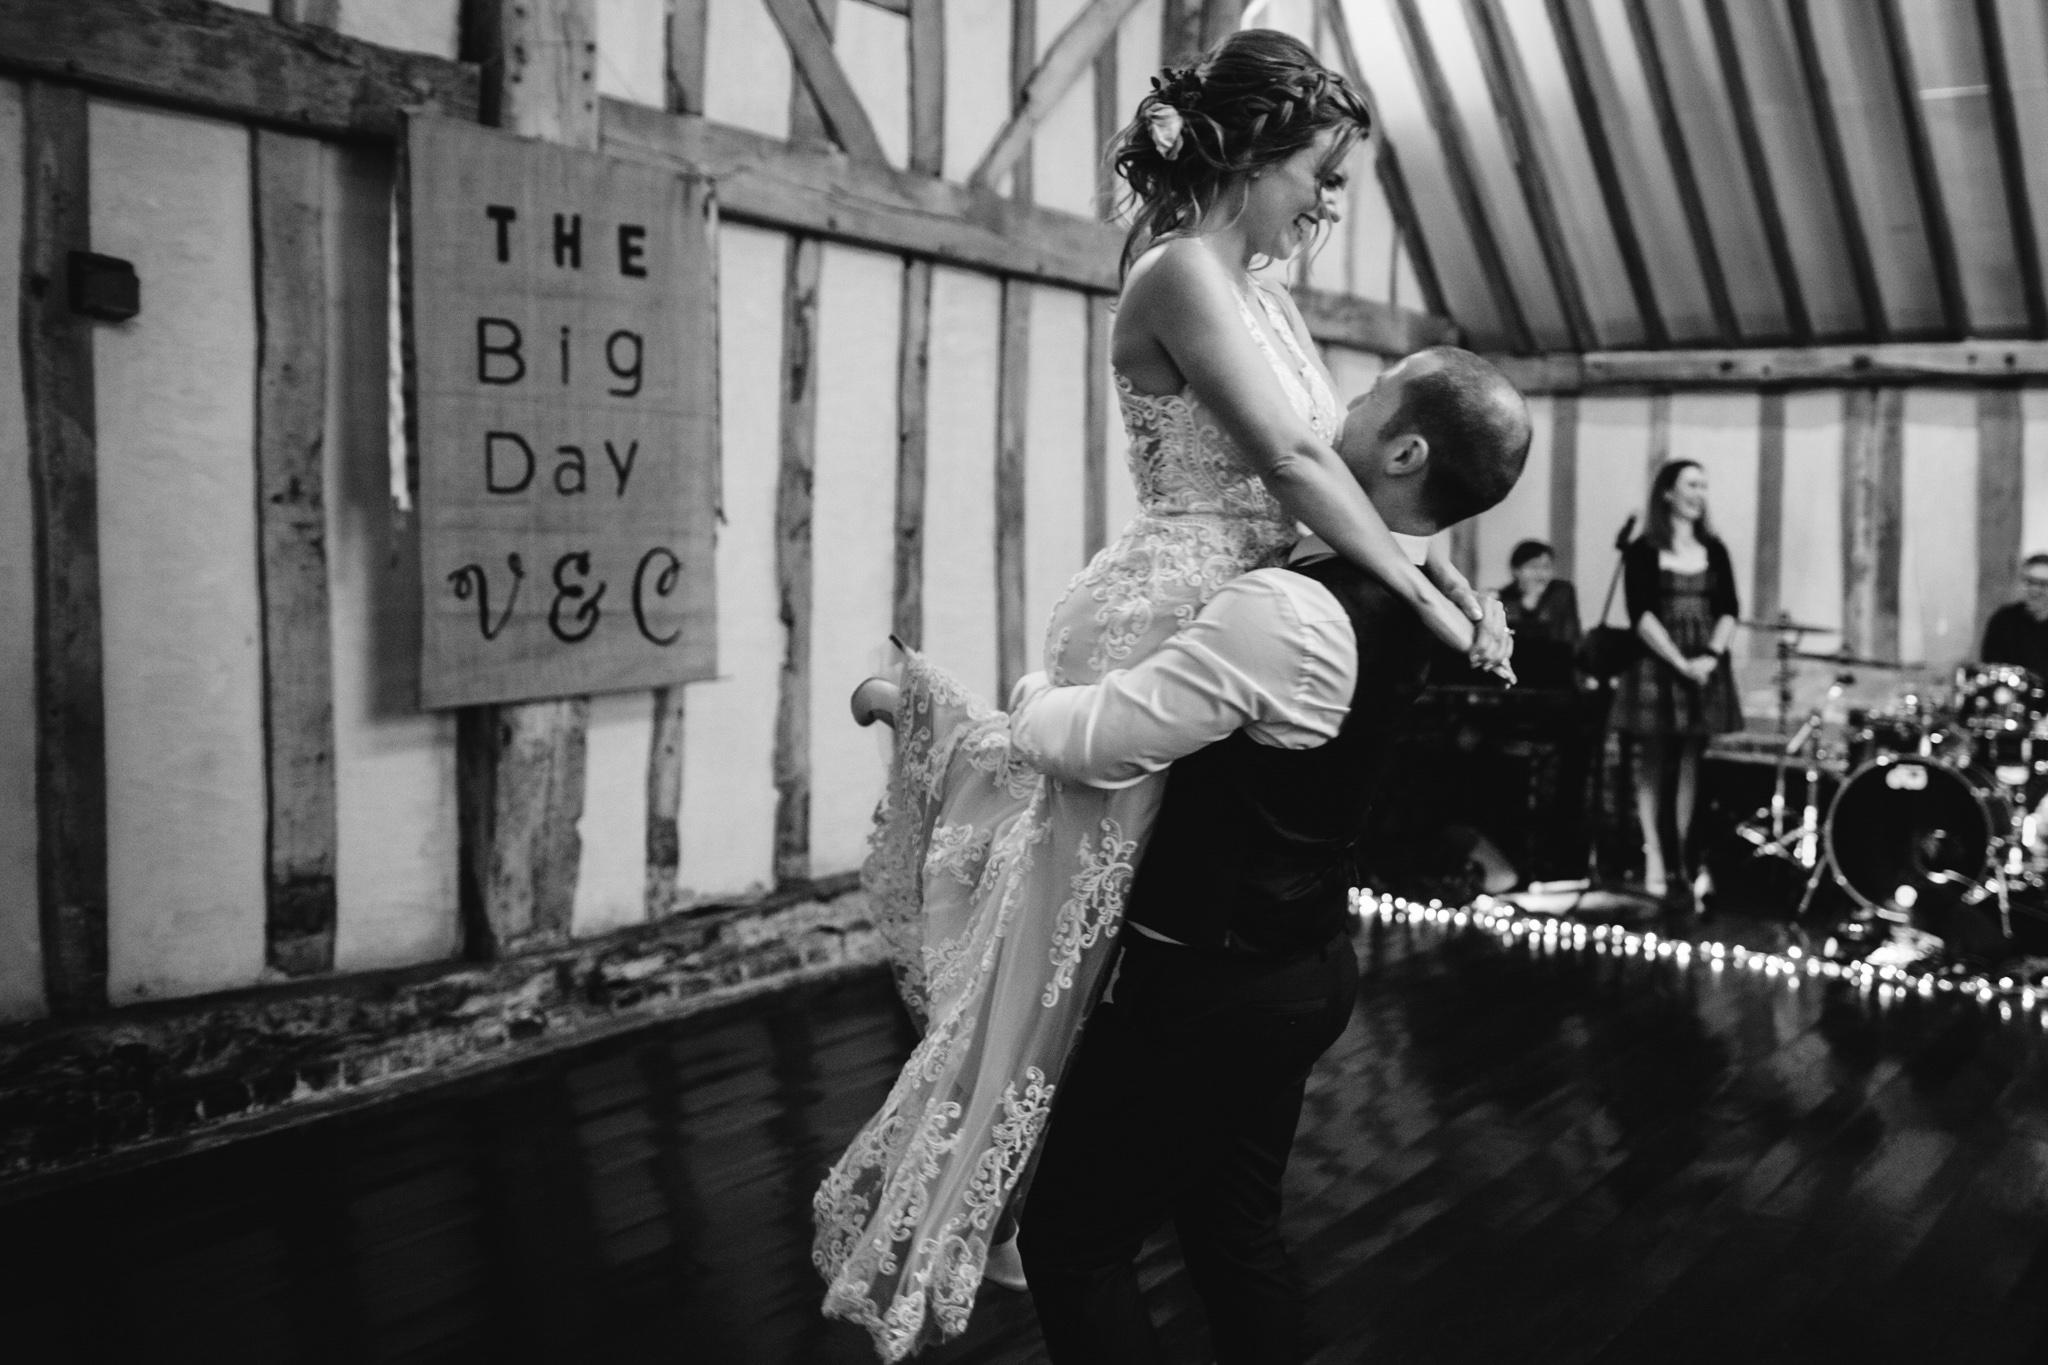 derbyshire-wedding-photographer-march-april-61.jpg